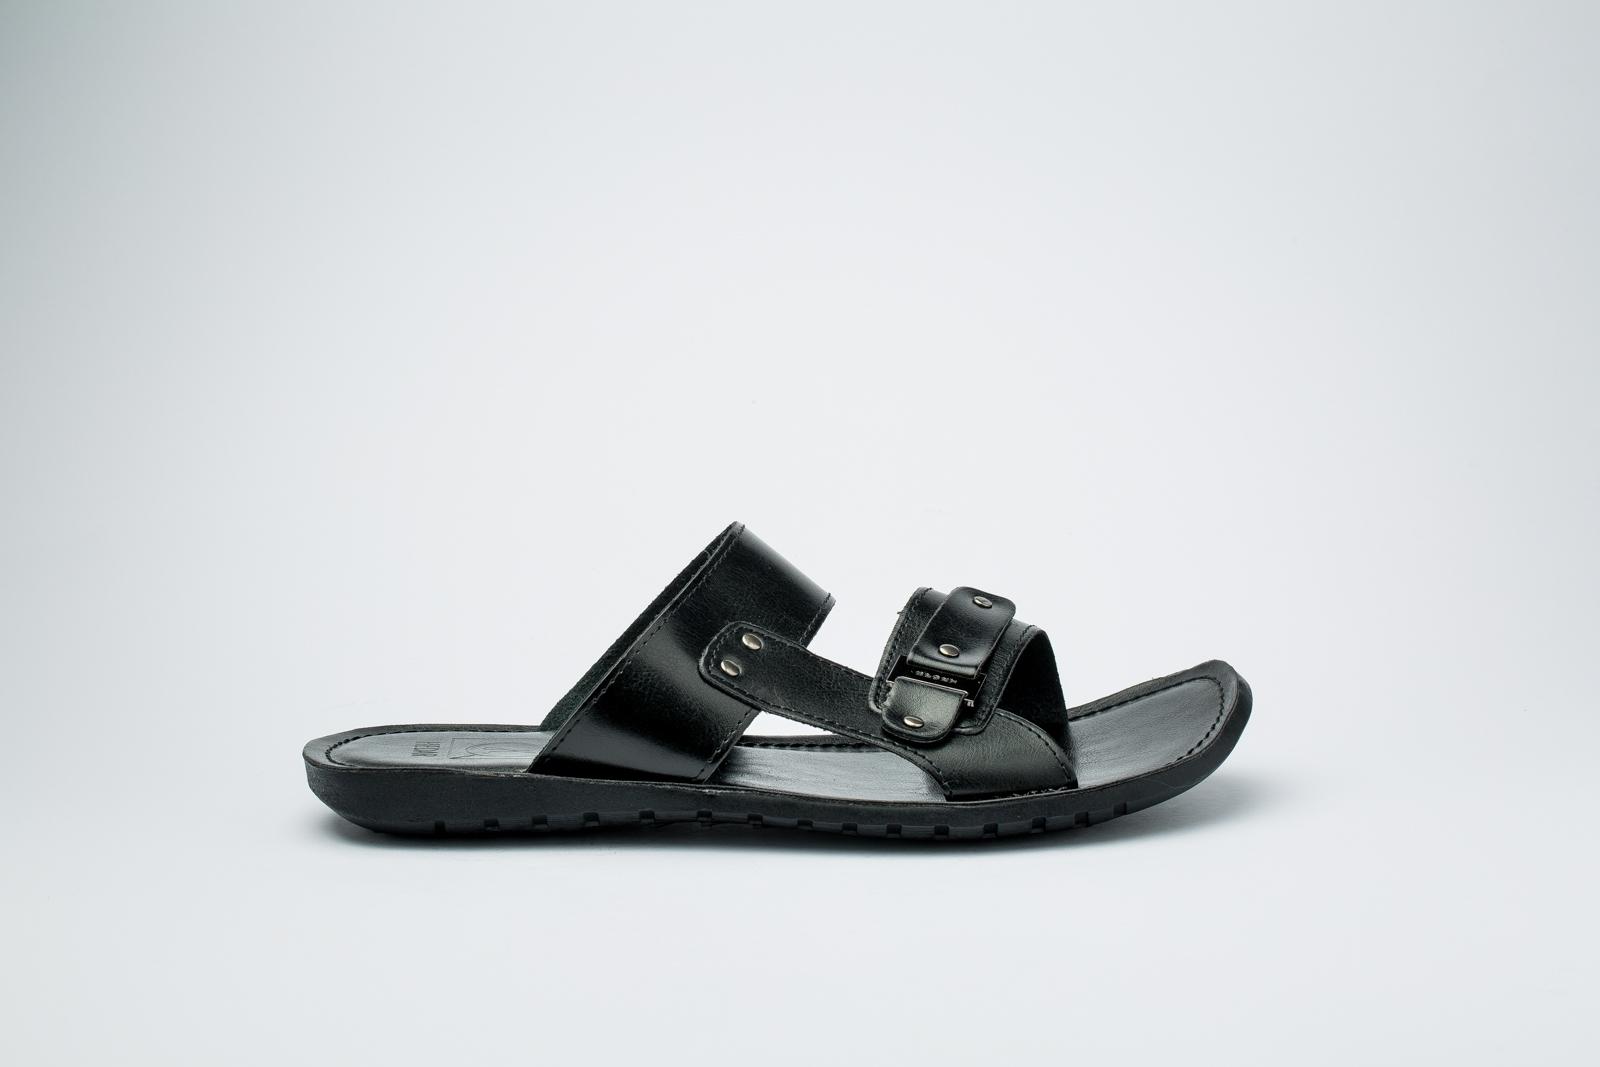 Picture of Black Slipper